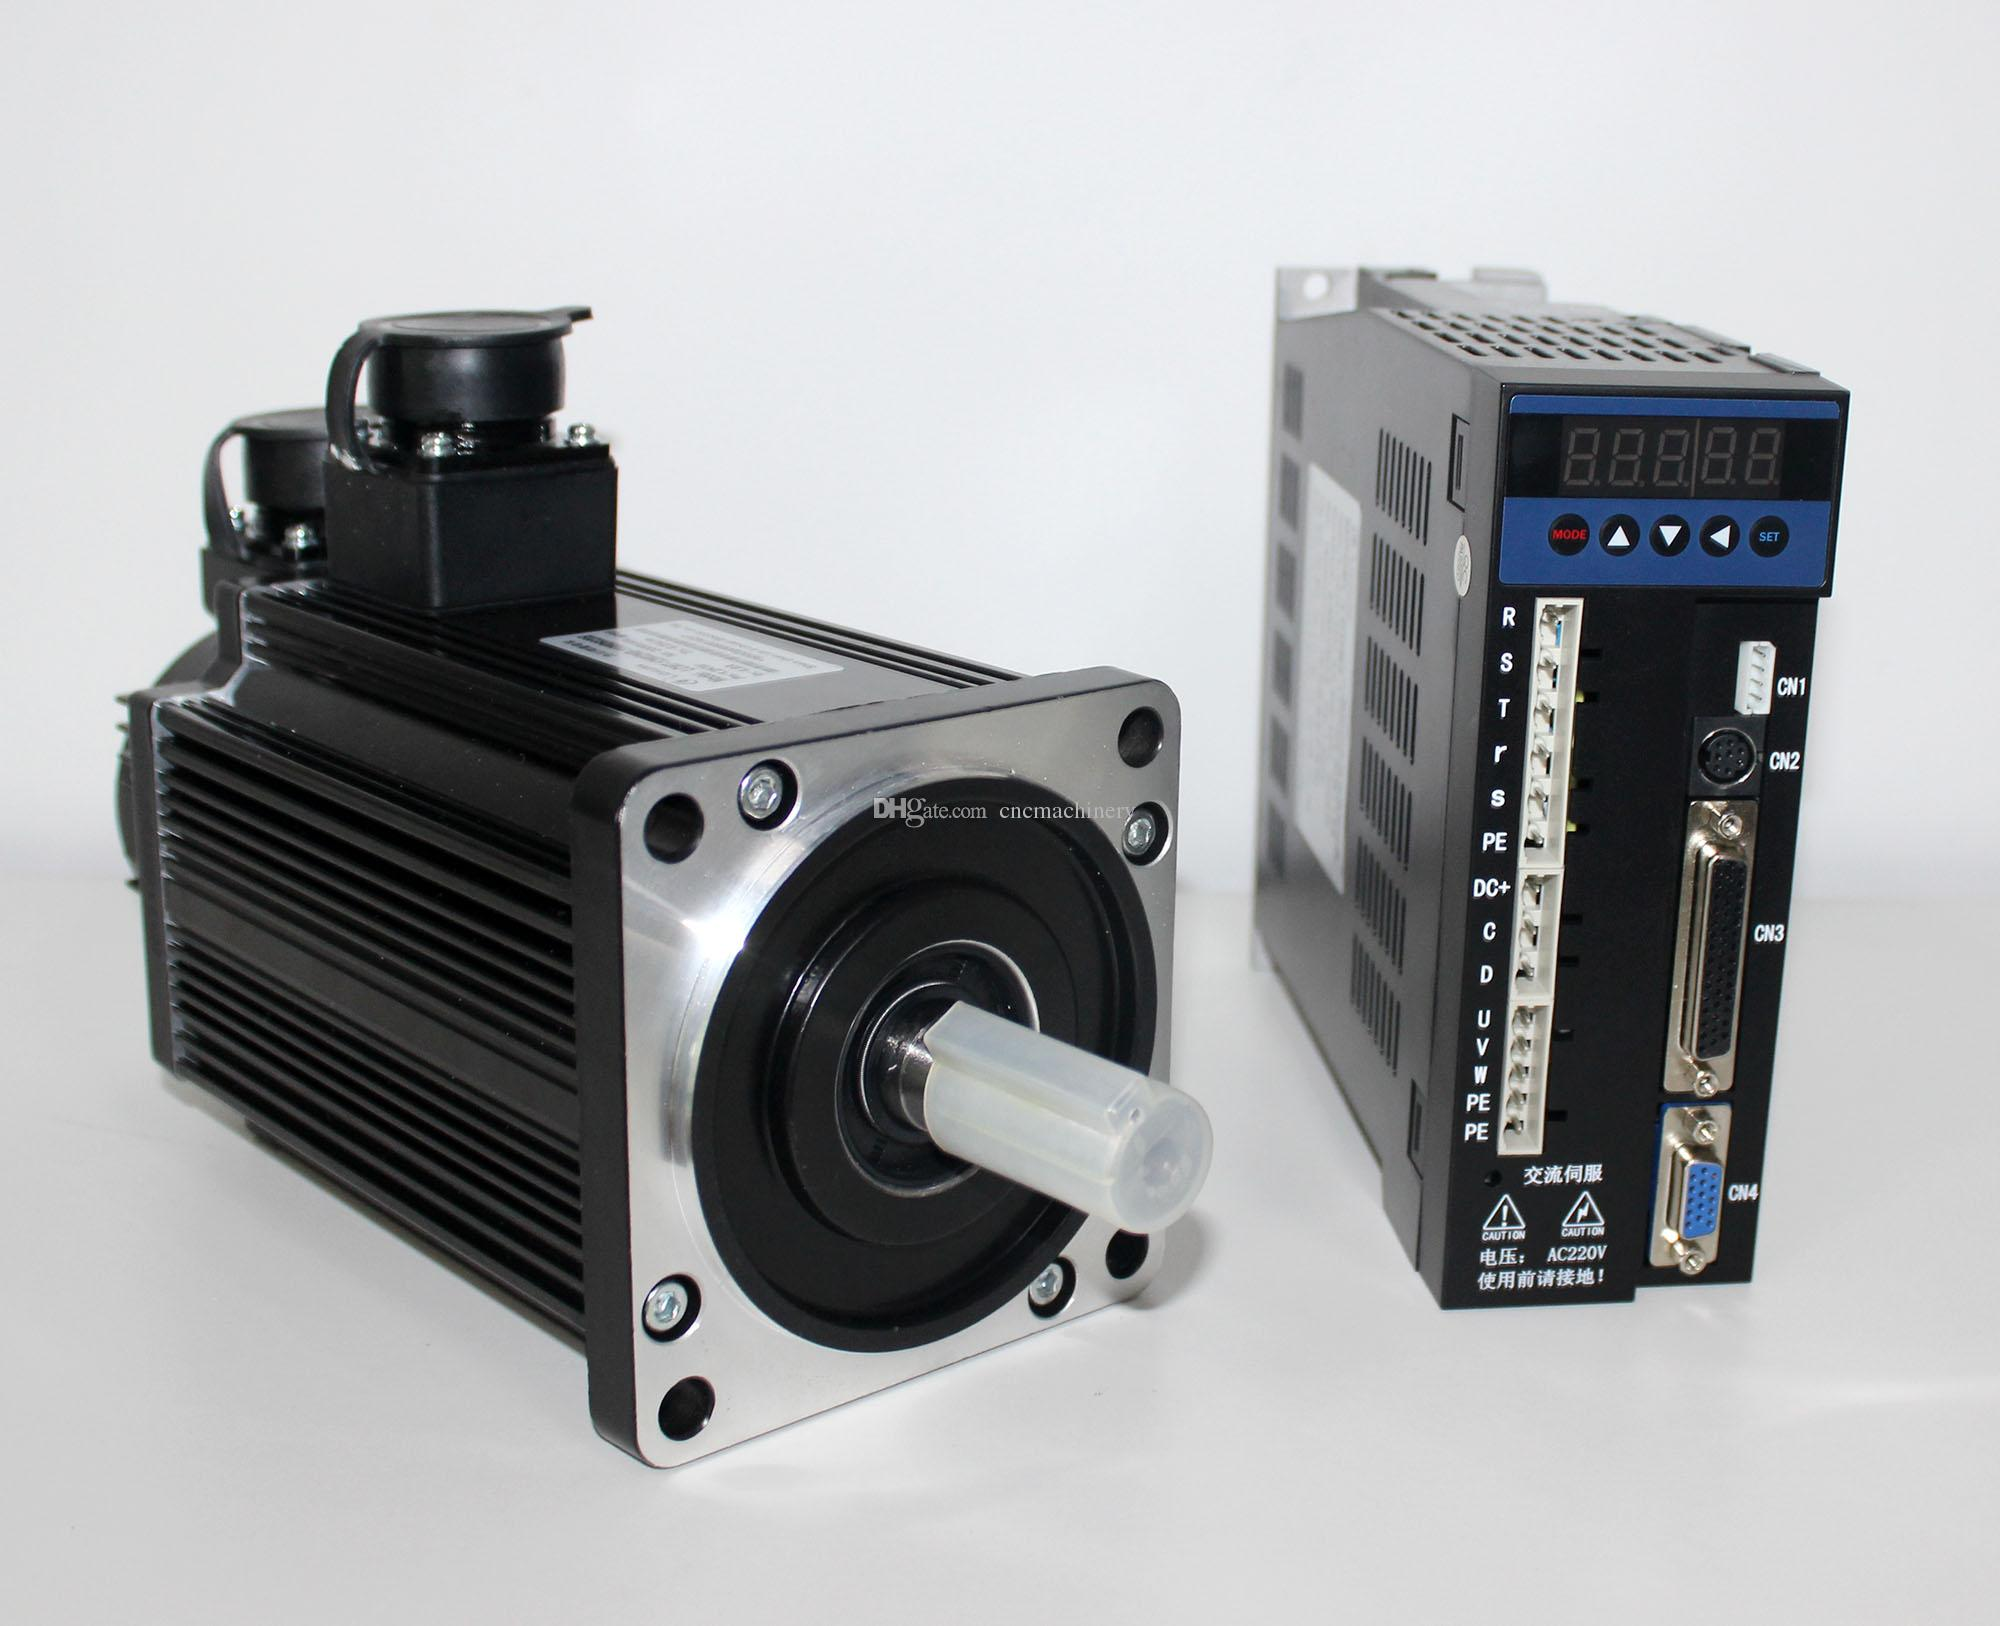 1500W 110mm 5N m servo motor kit with brake 3000rpm 220v 708oz in  110ST-M05030 AC sevomotor set for beads machine woodworking